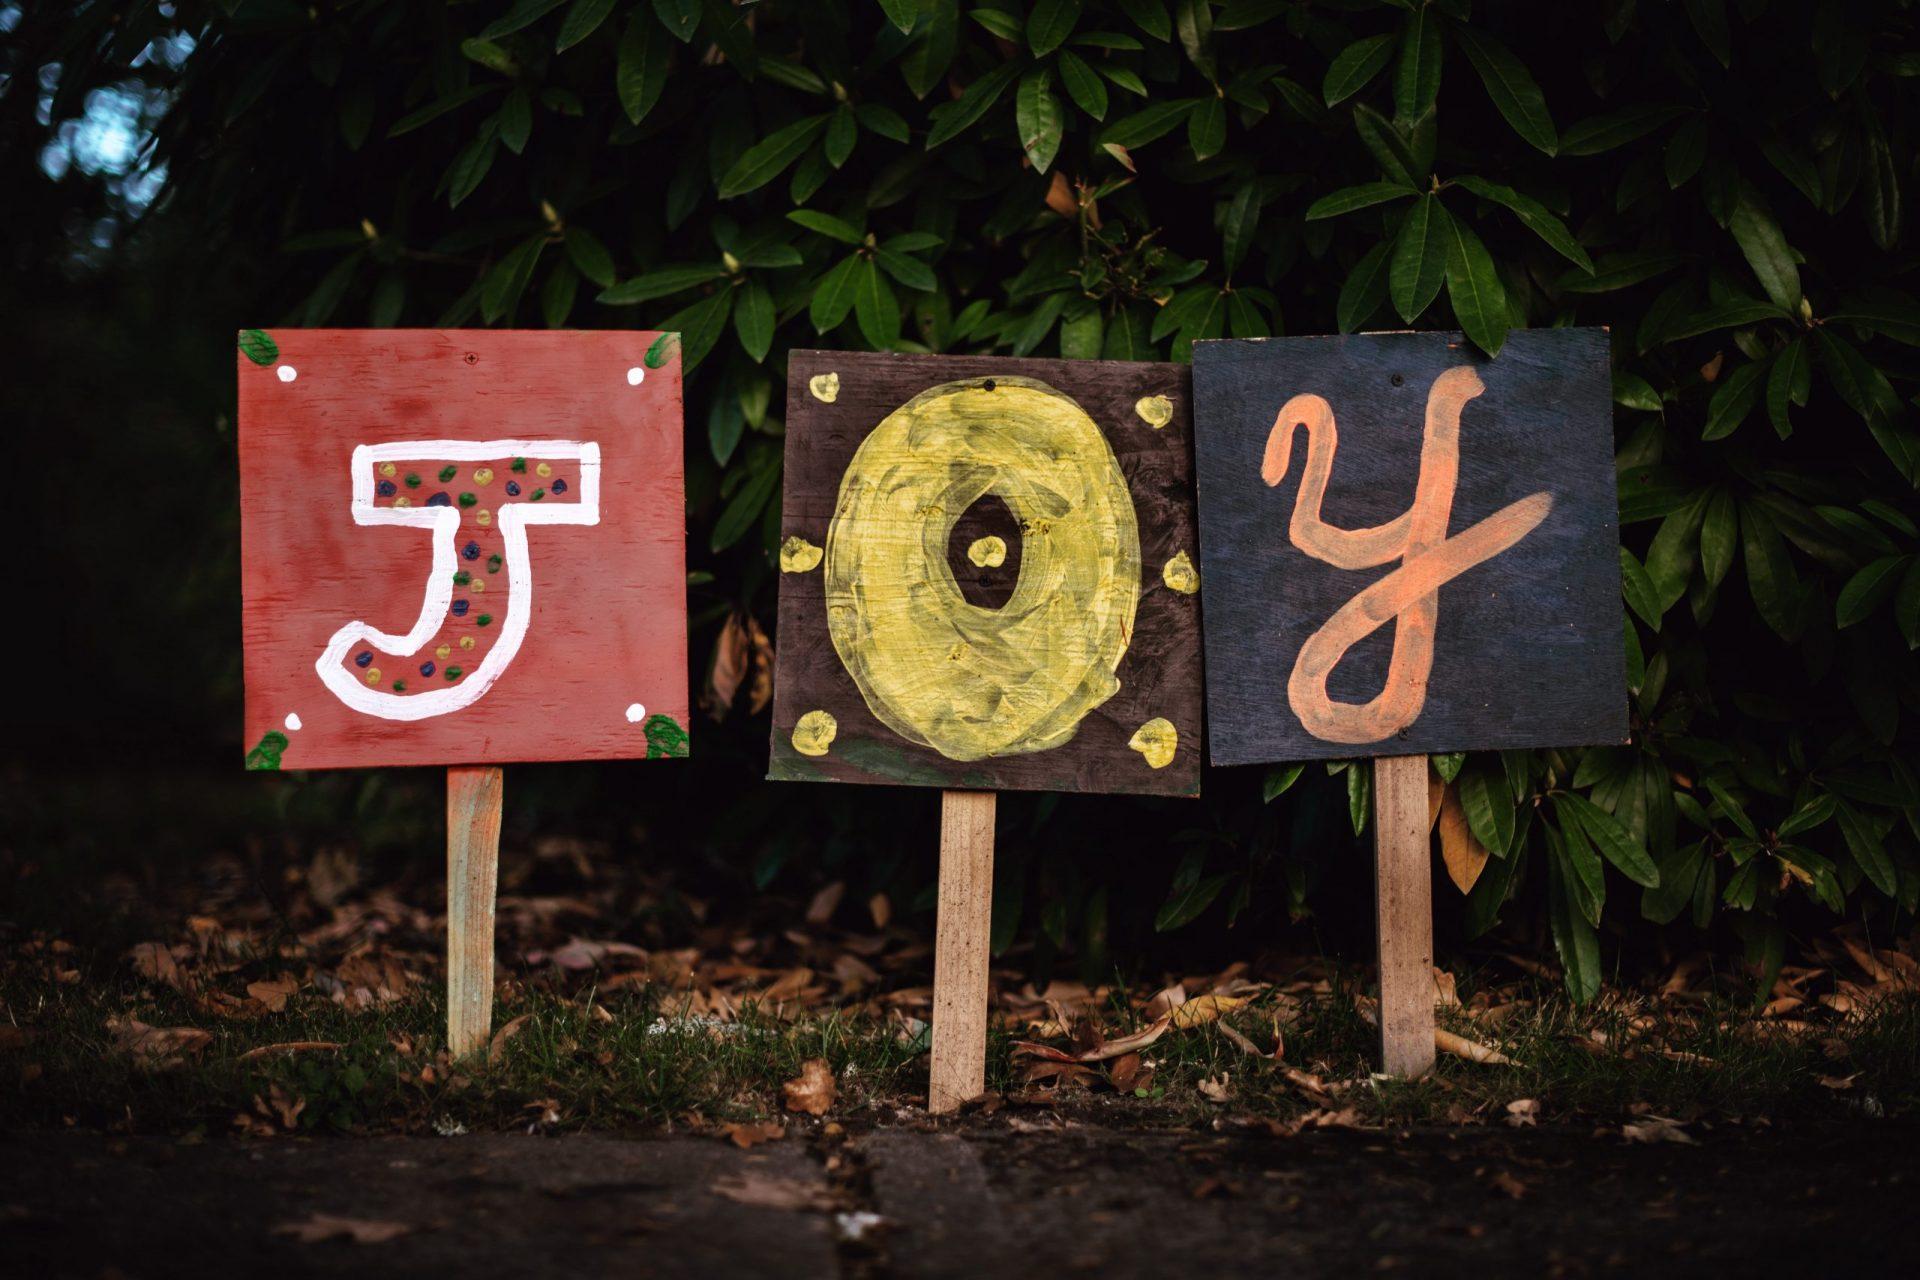 <span class='p-name'>Joy, Love, & Aesthetic Fulfillment</span>